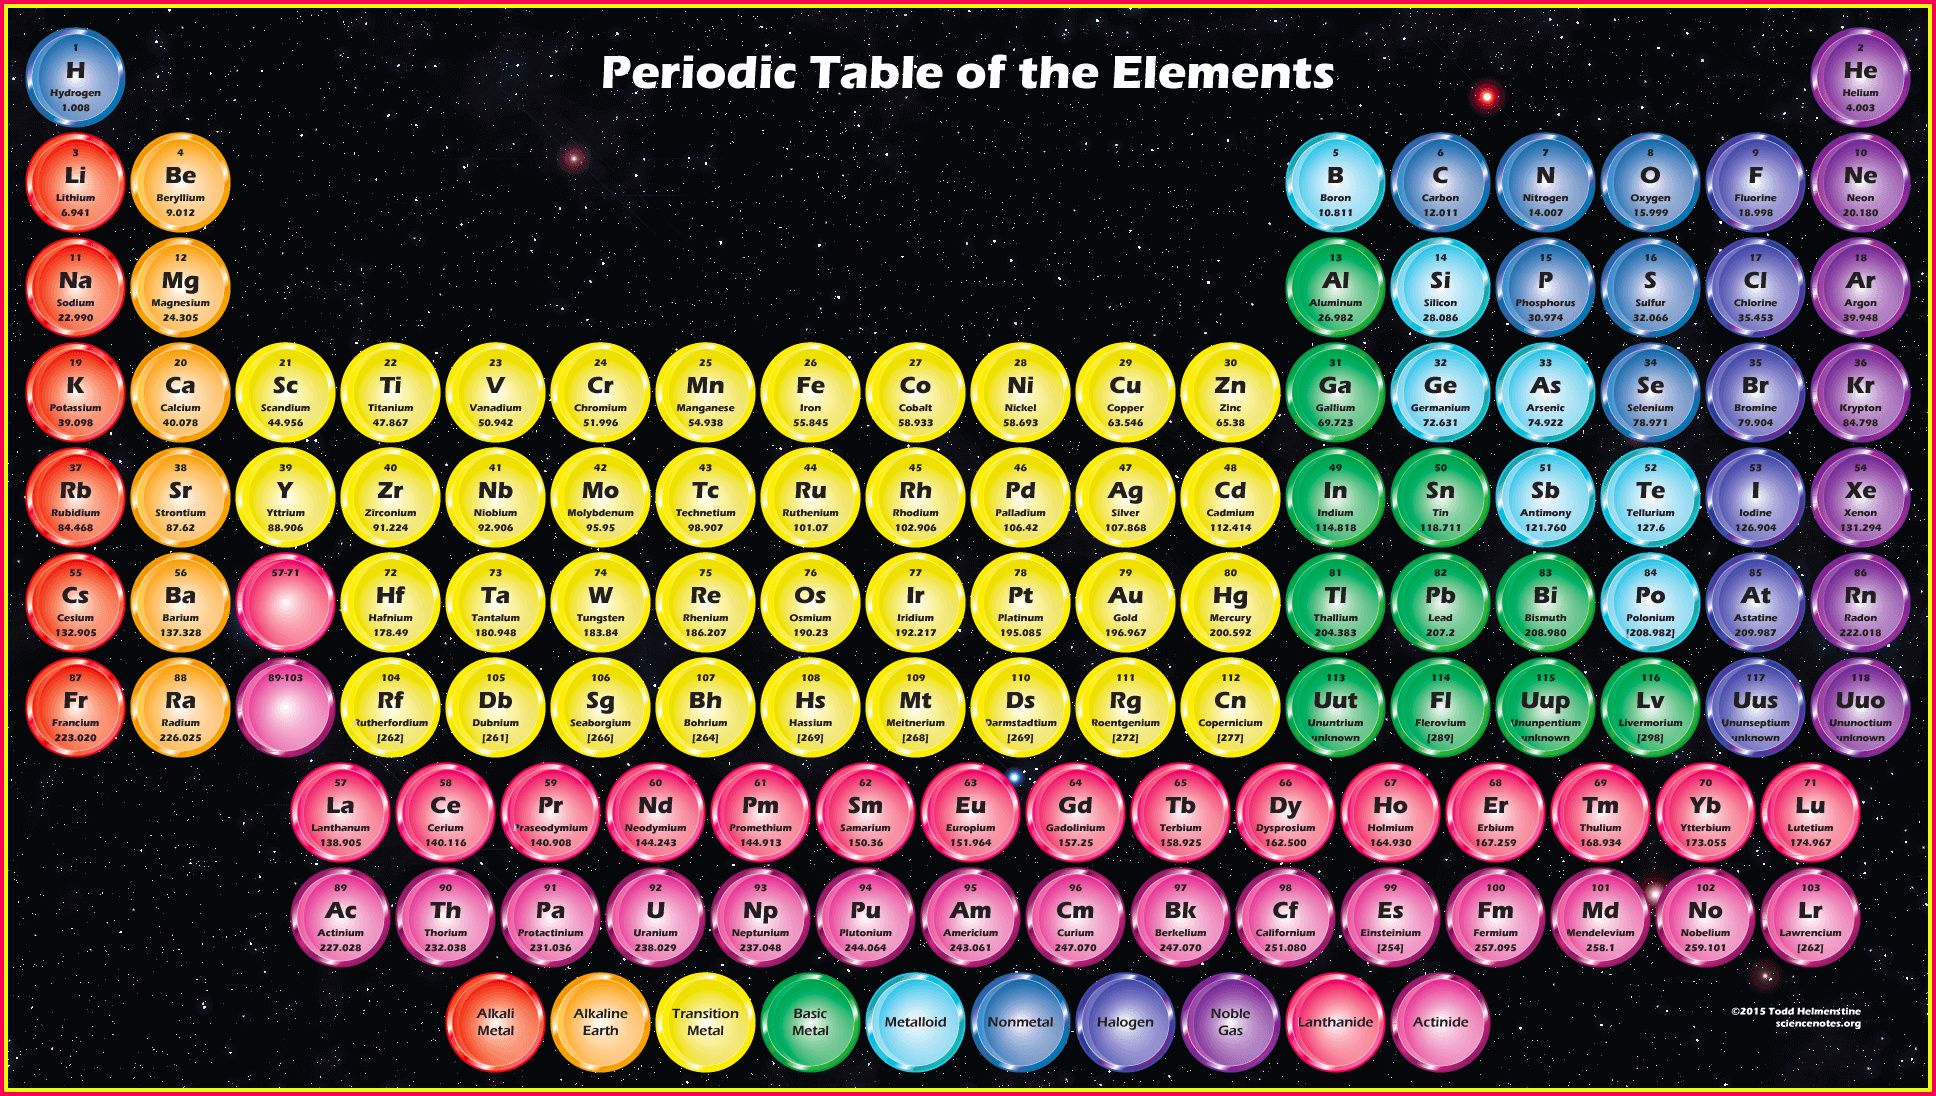 Periodic table wallpaper 1920x1080 periodic table wallpaper periodic table wallpaper 1920x1080 gamestrikefo Images